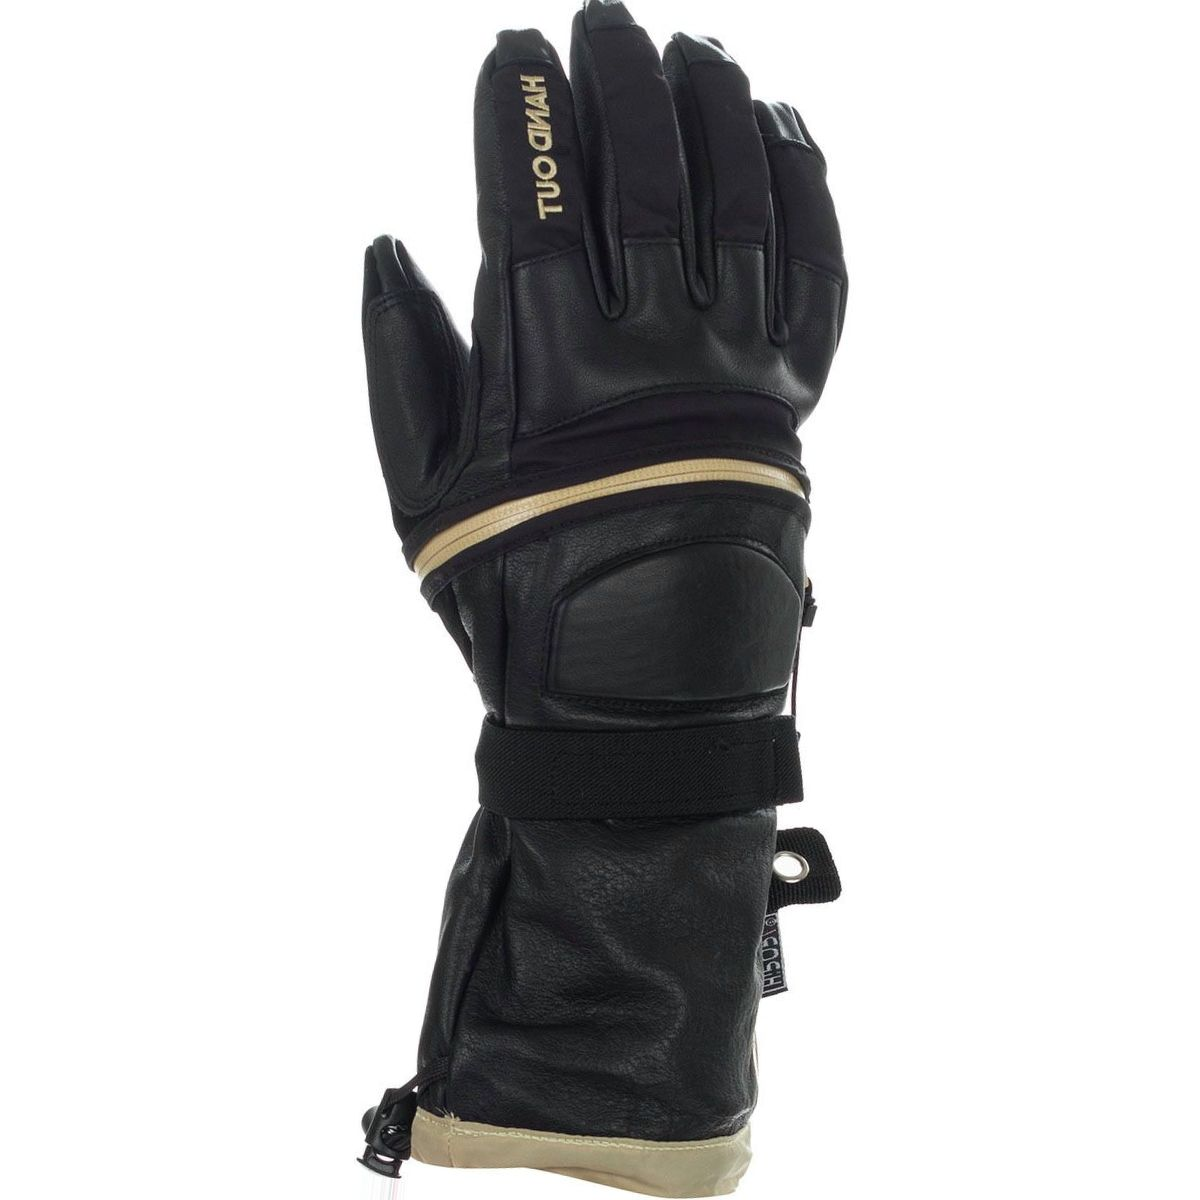 Hand Out Alturas Glove - Men's